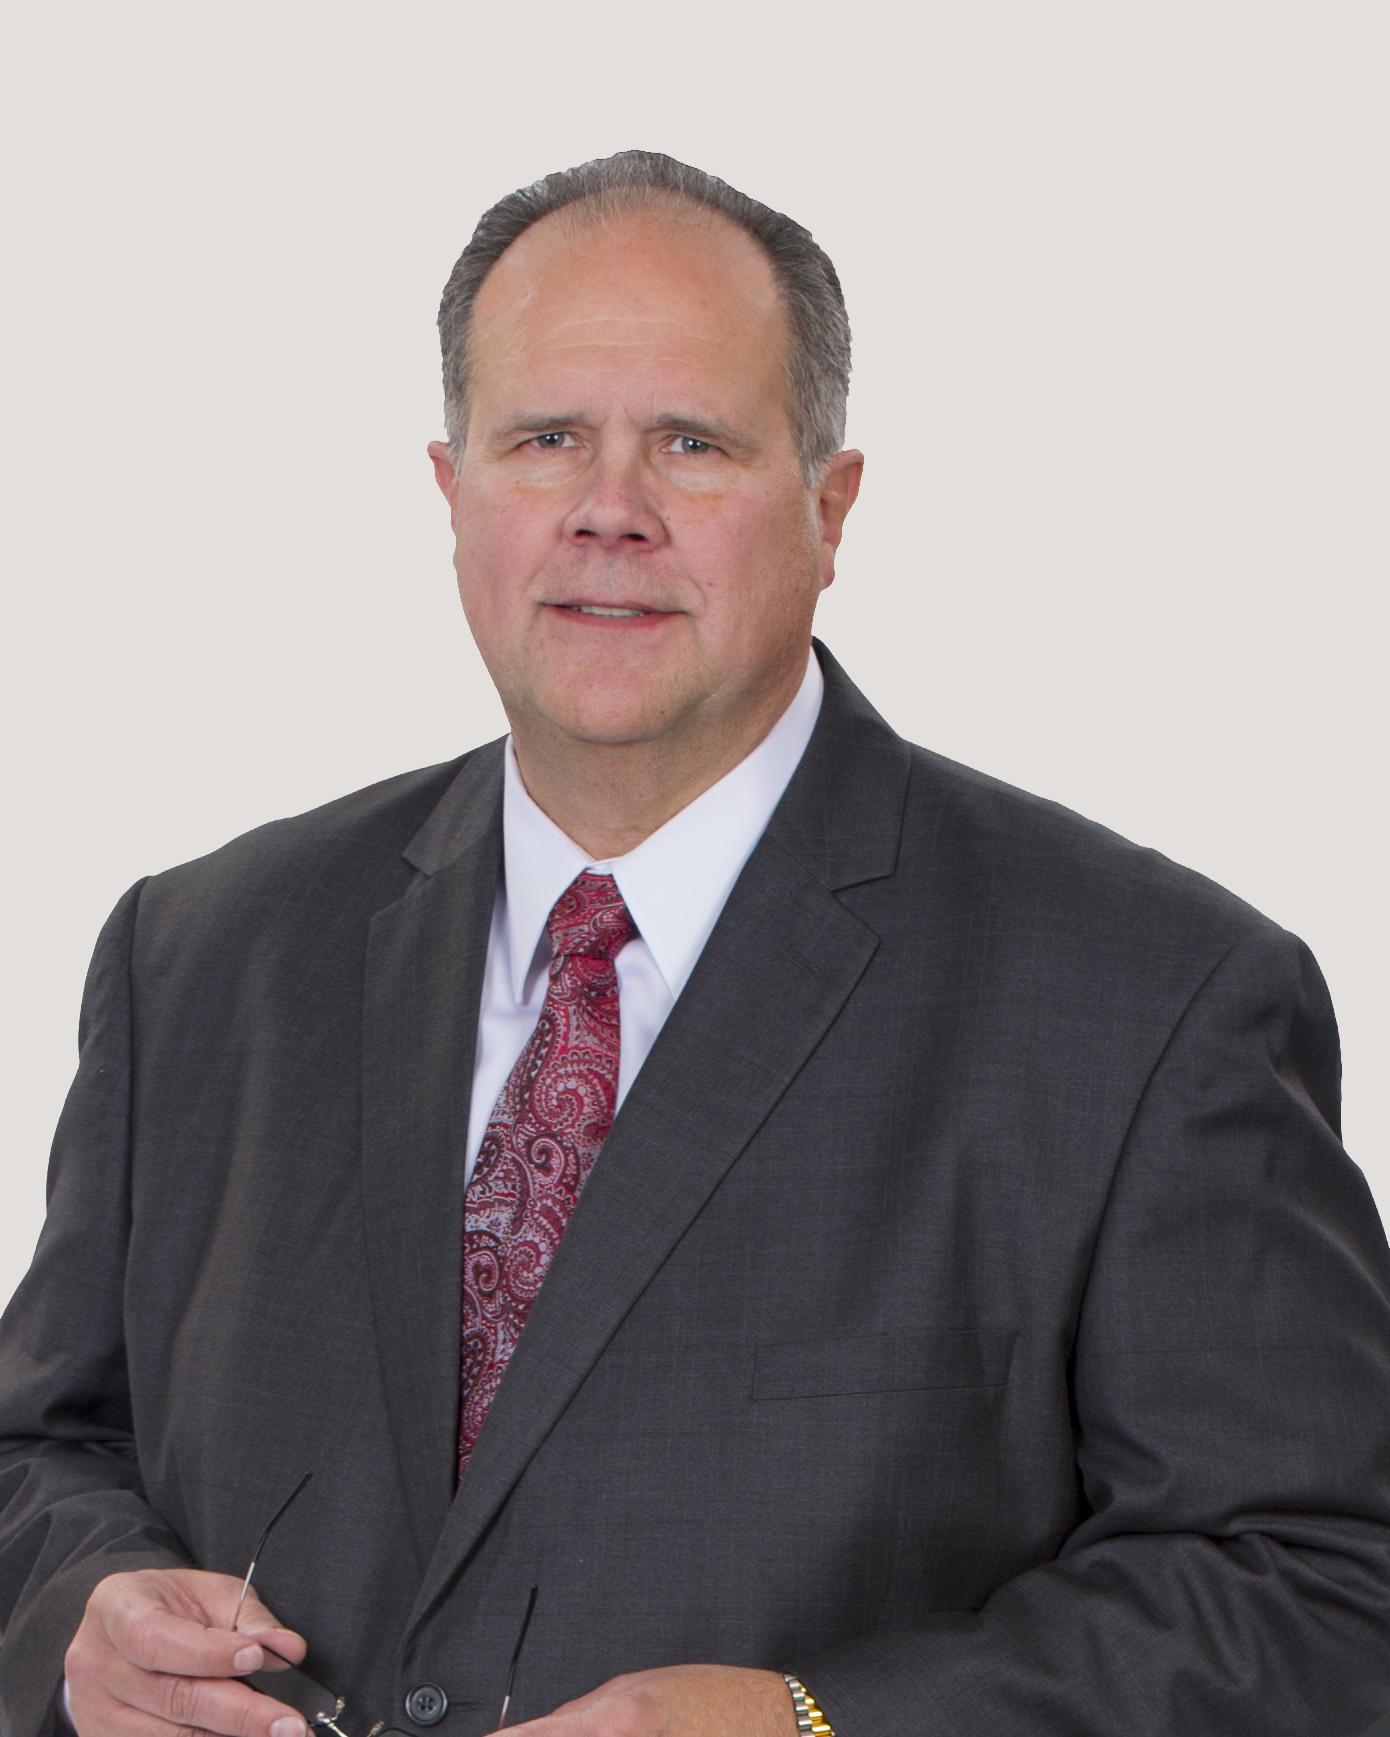 Scott Holt